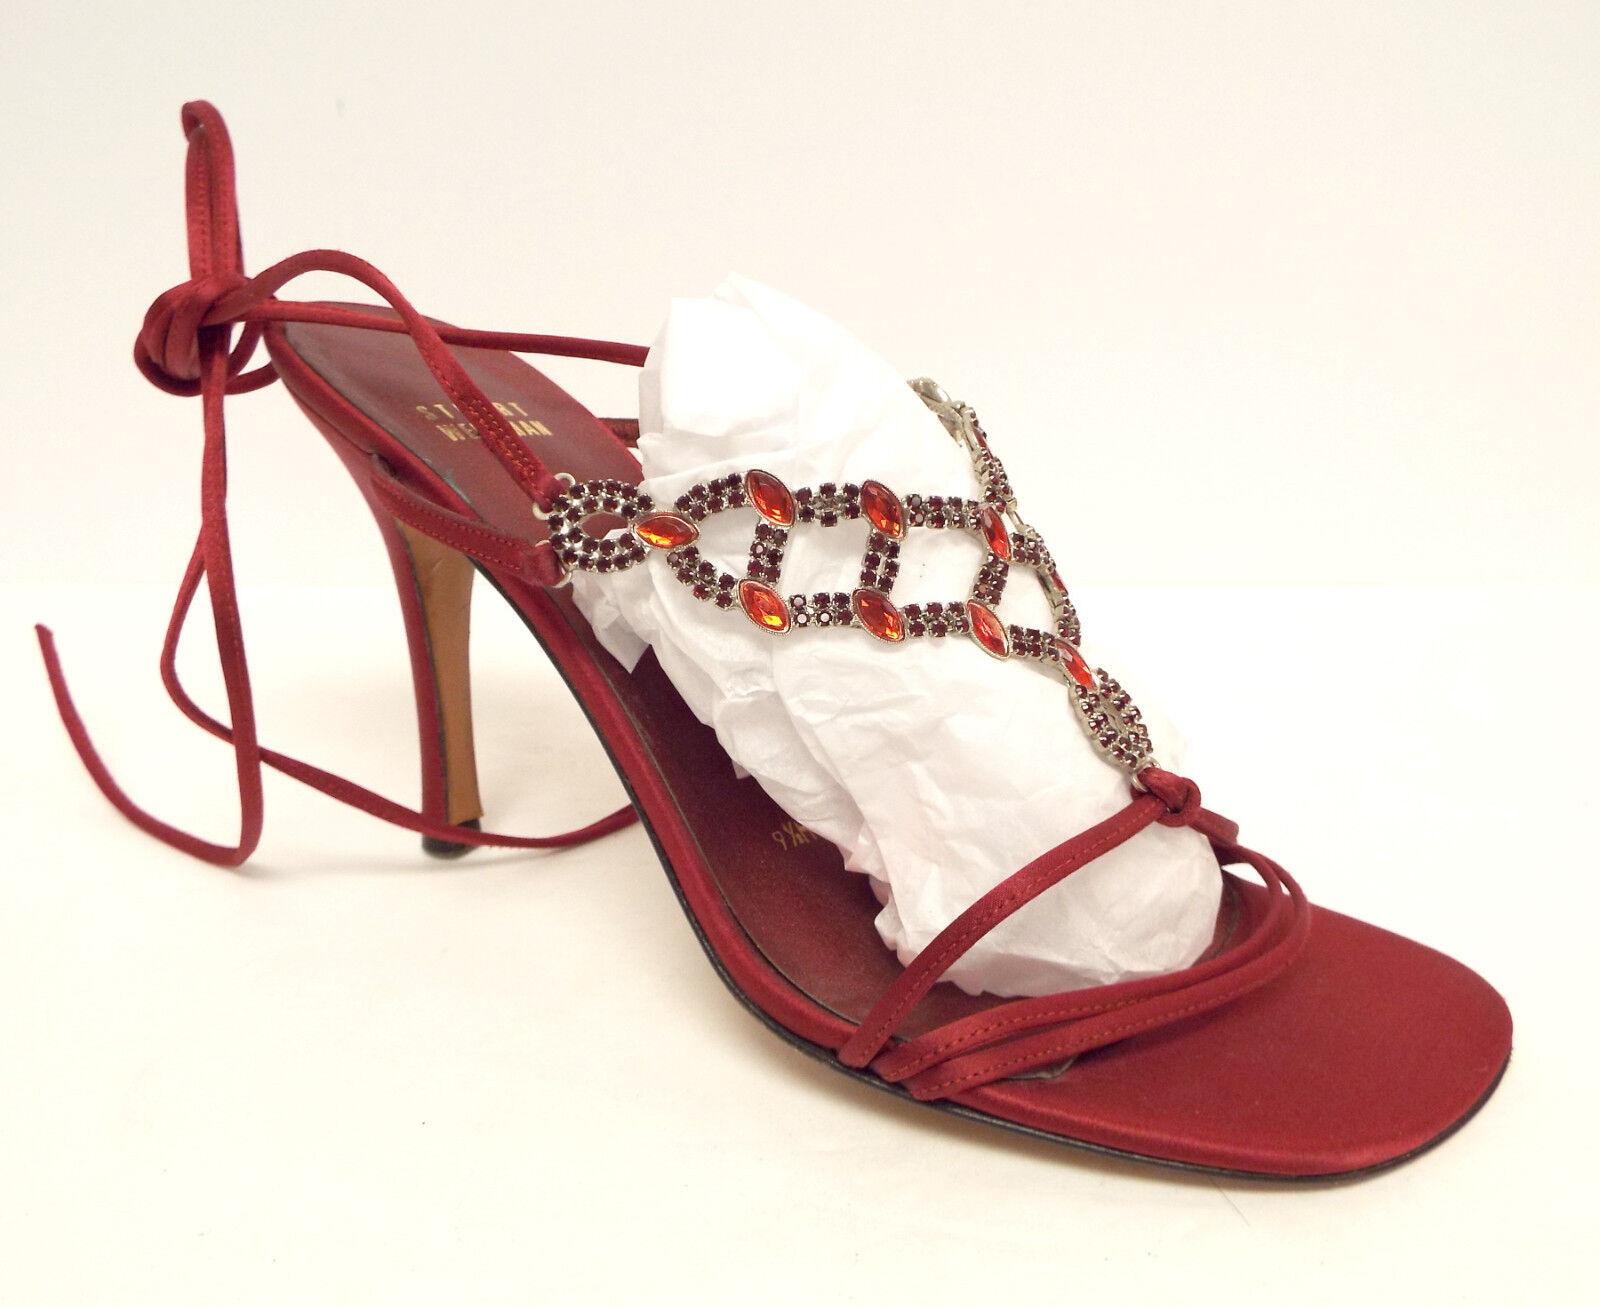 STUART WEITZMAN Size 9.5 Red Satin Jeweled Evening Heels Sandals Shoes 9 1/2